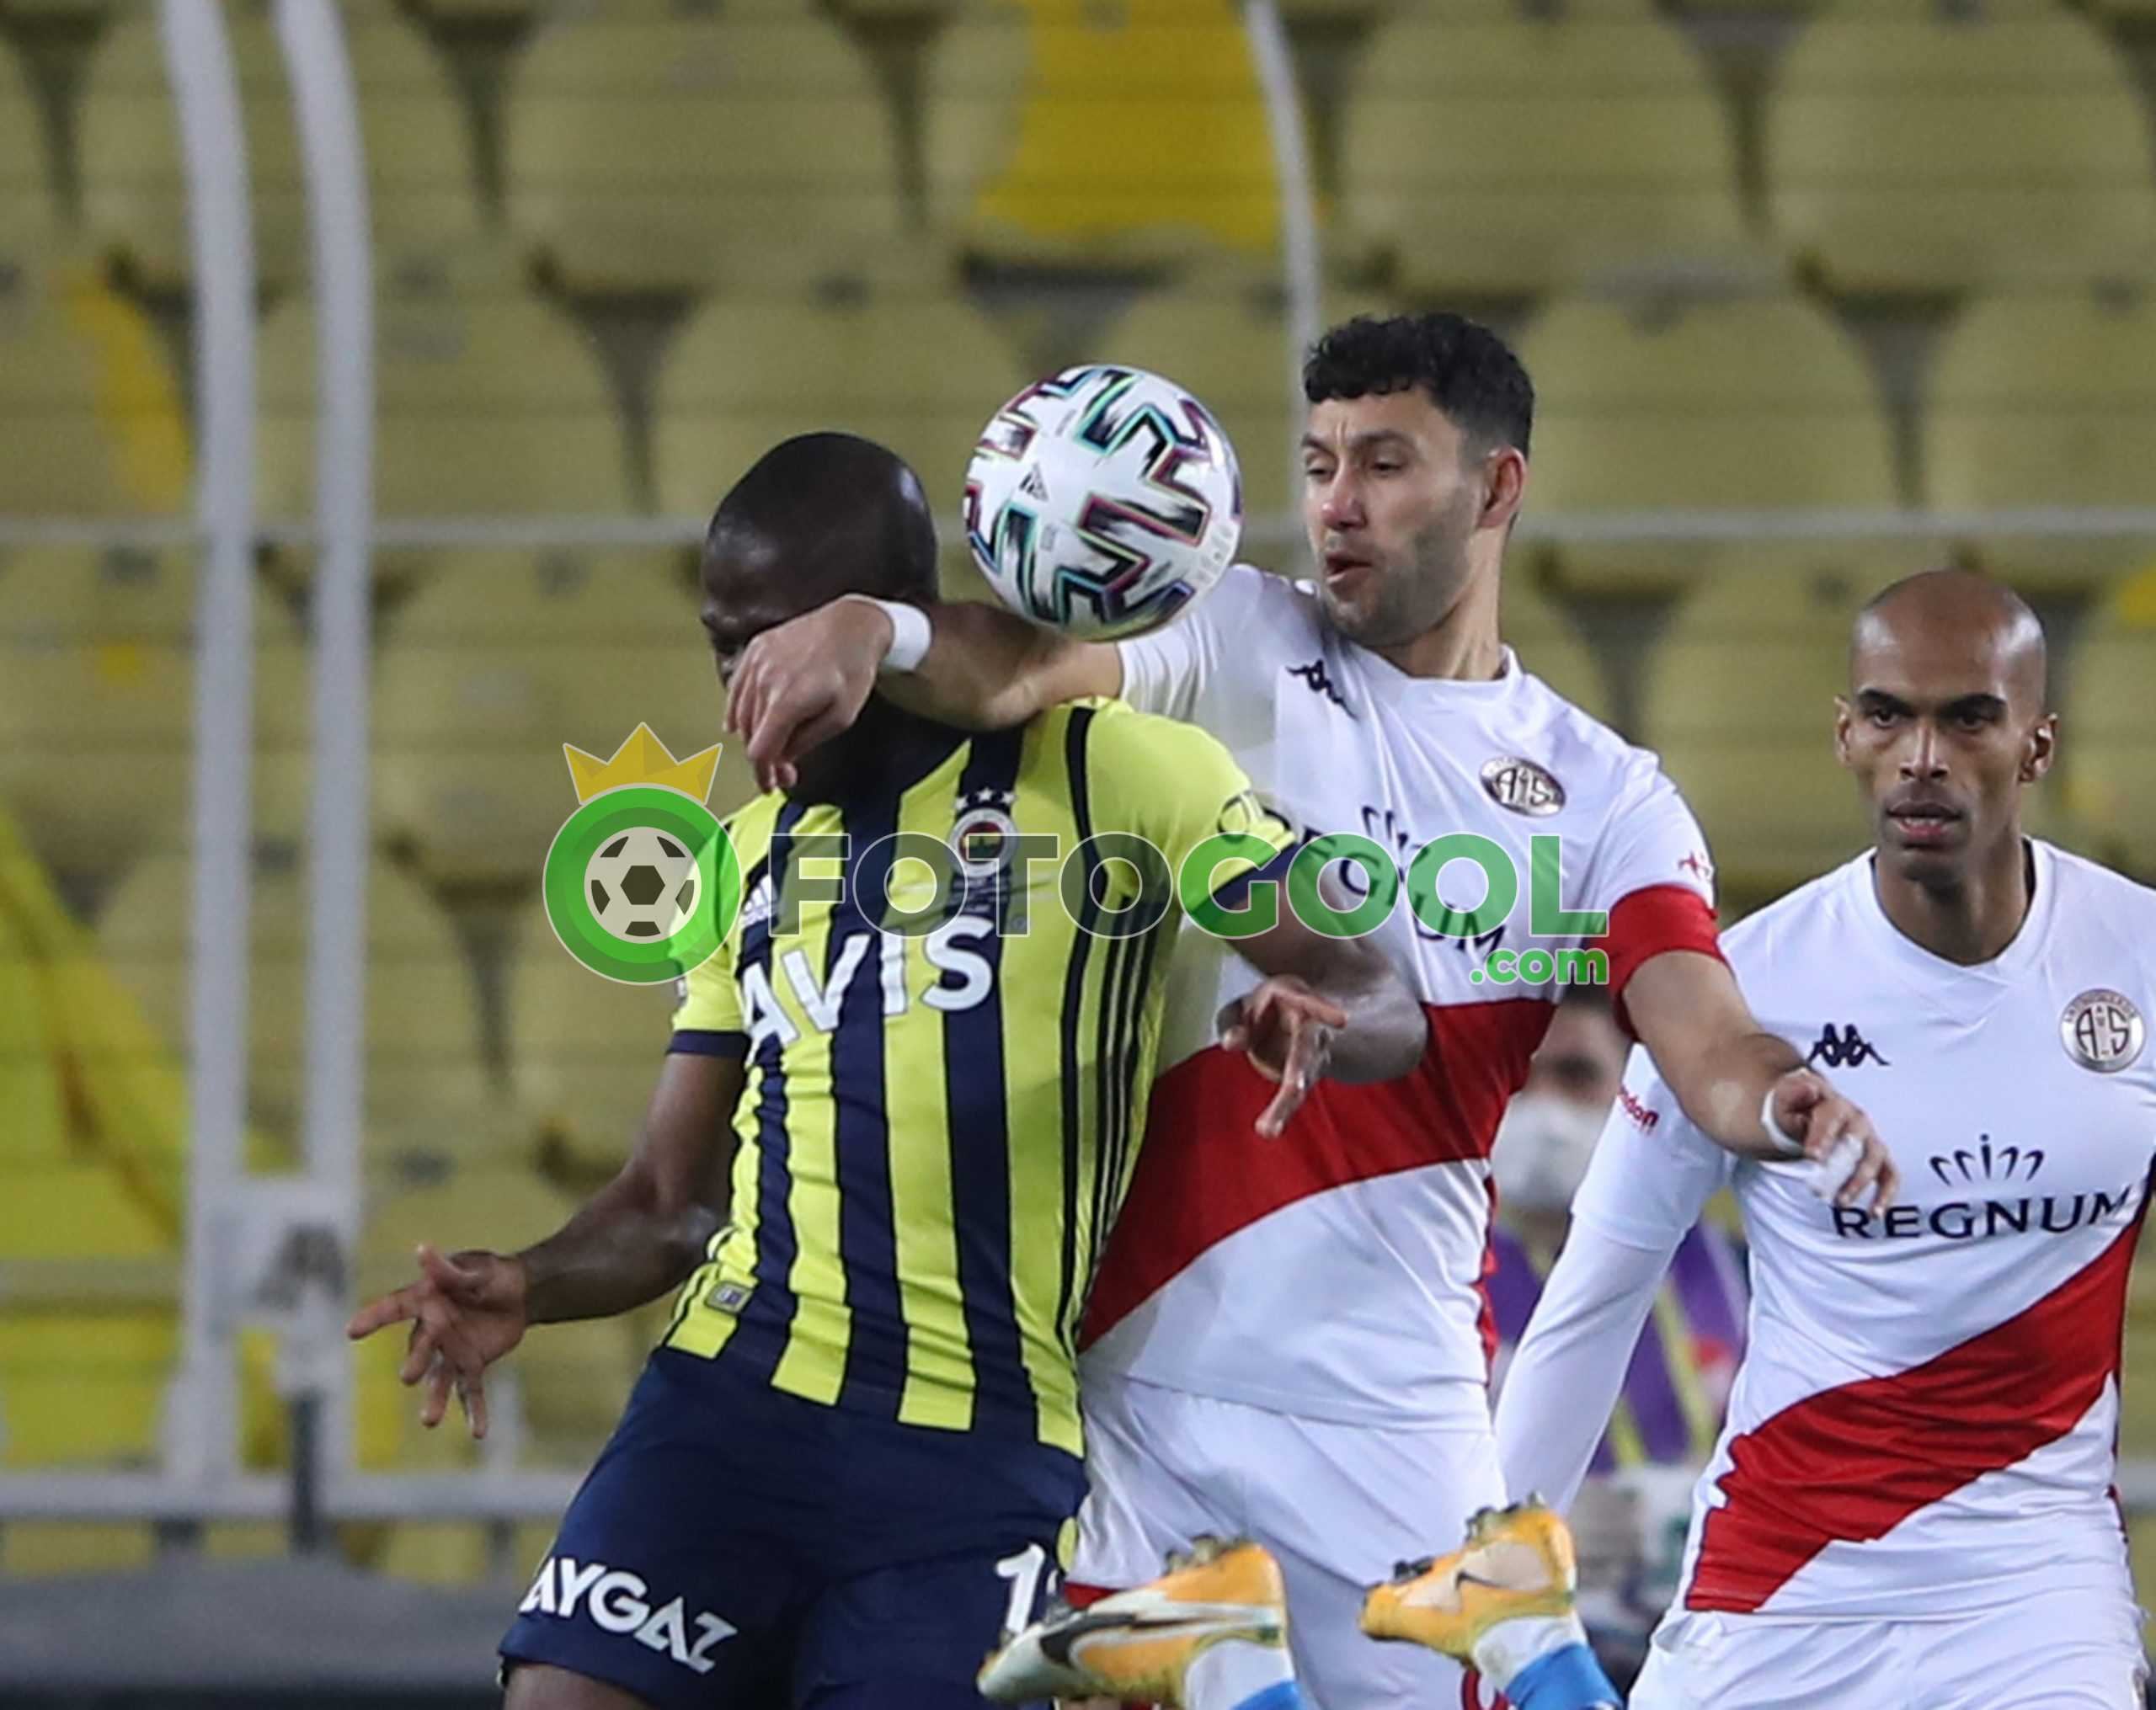 Fenerbahçe evinde kayıp. 1-1